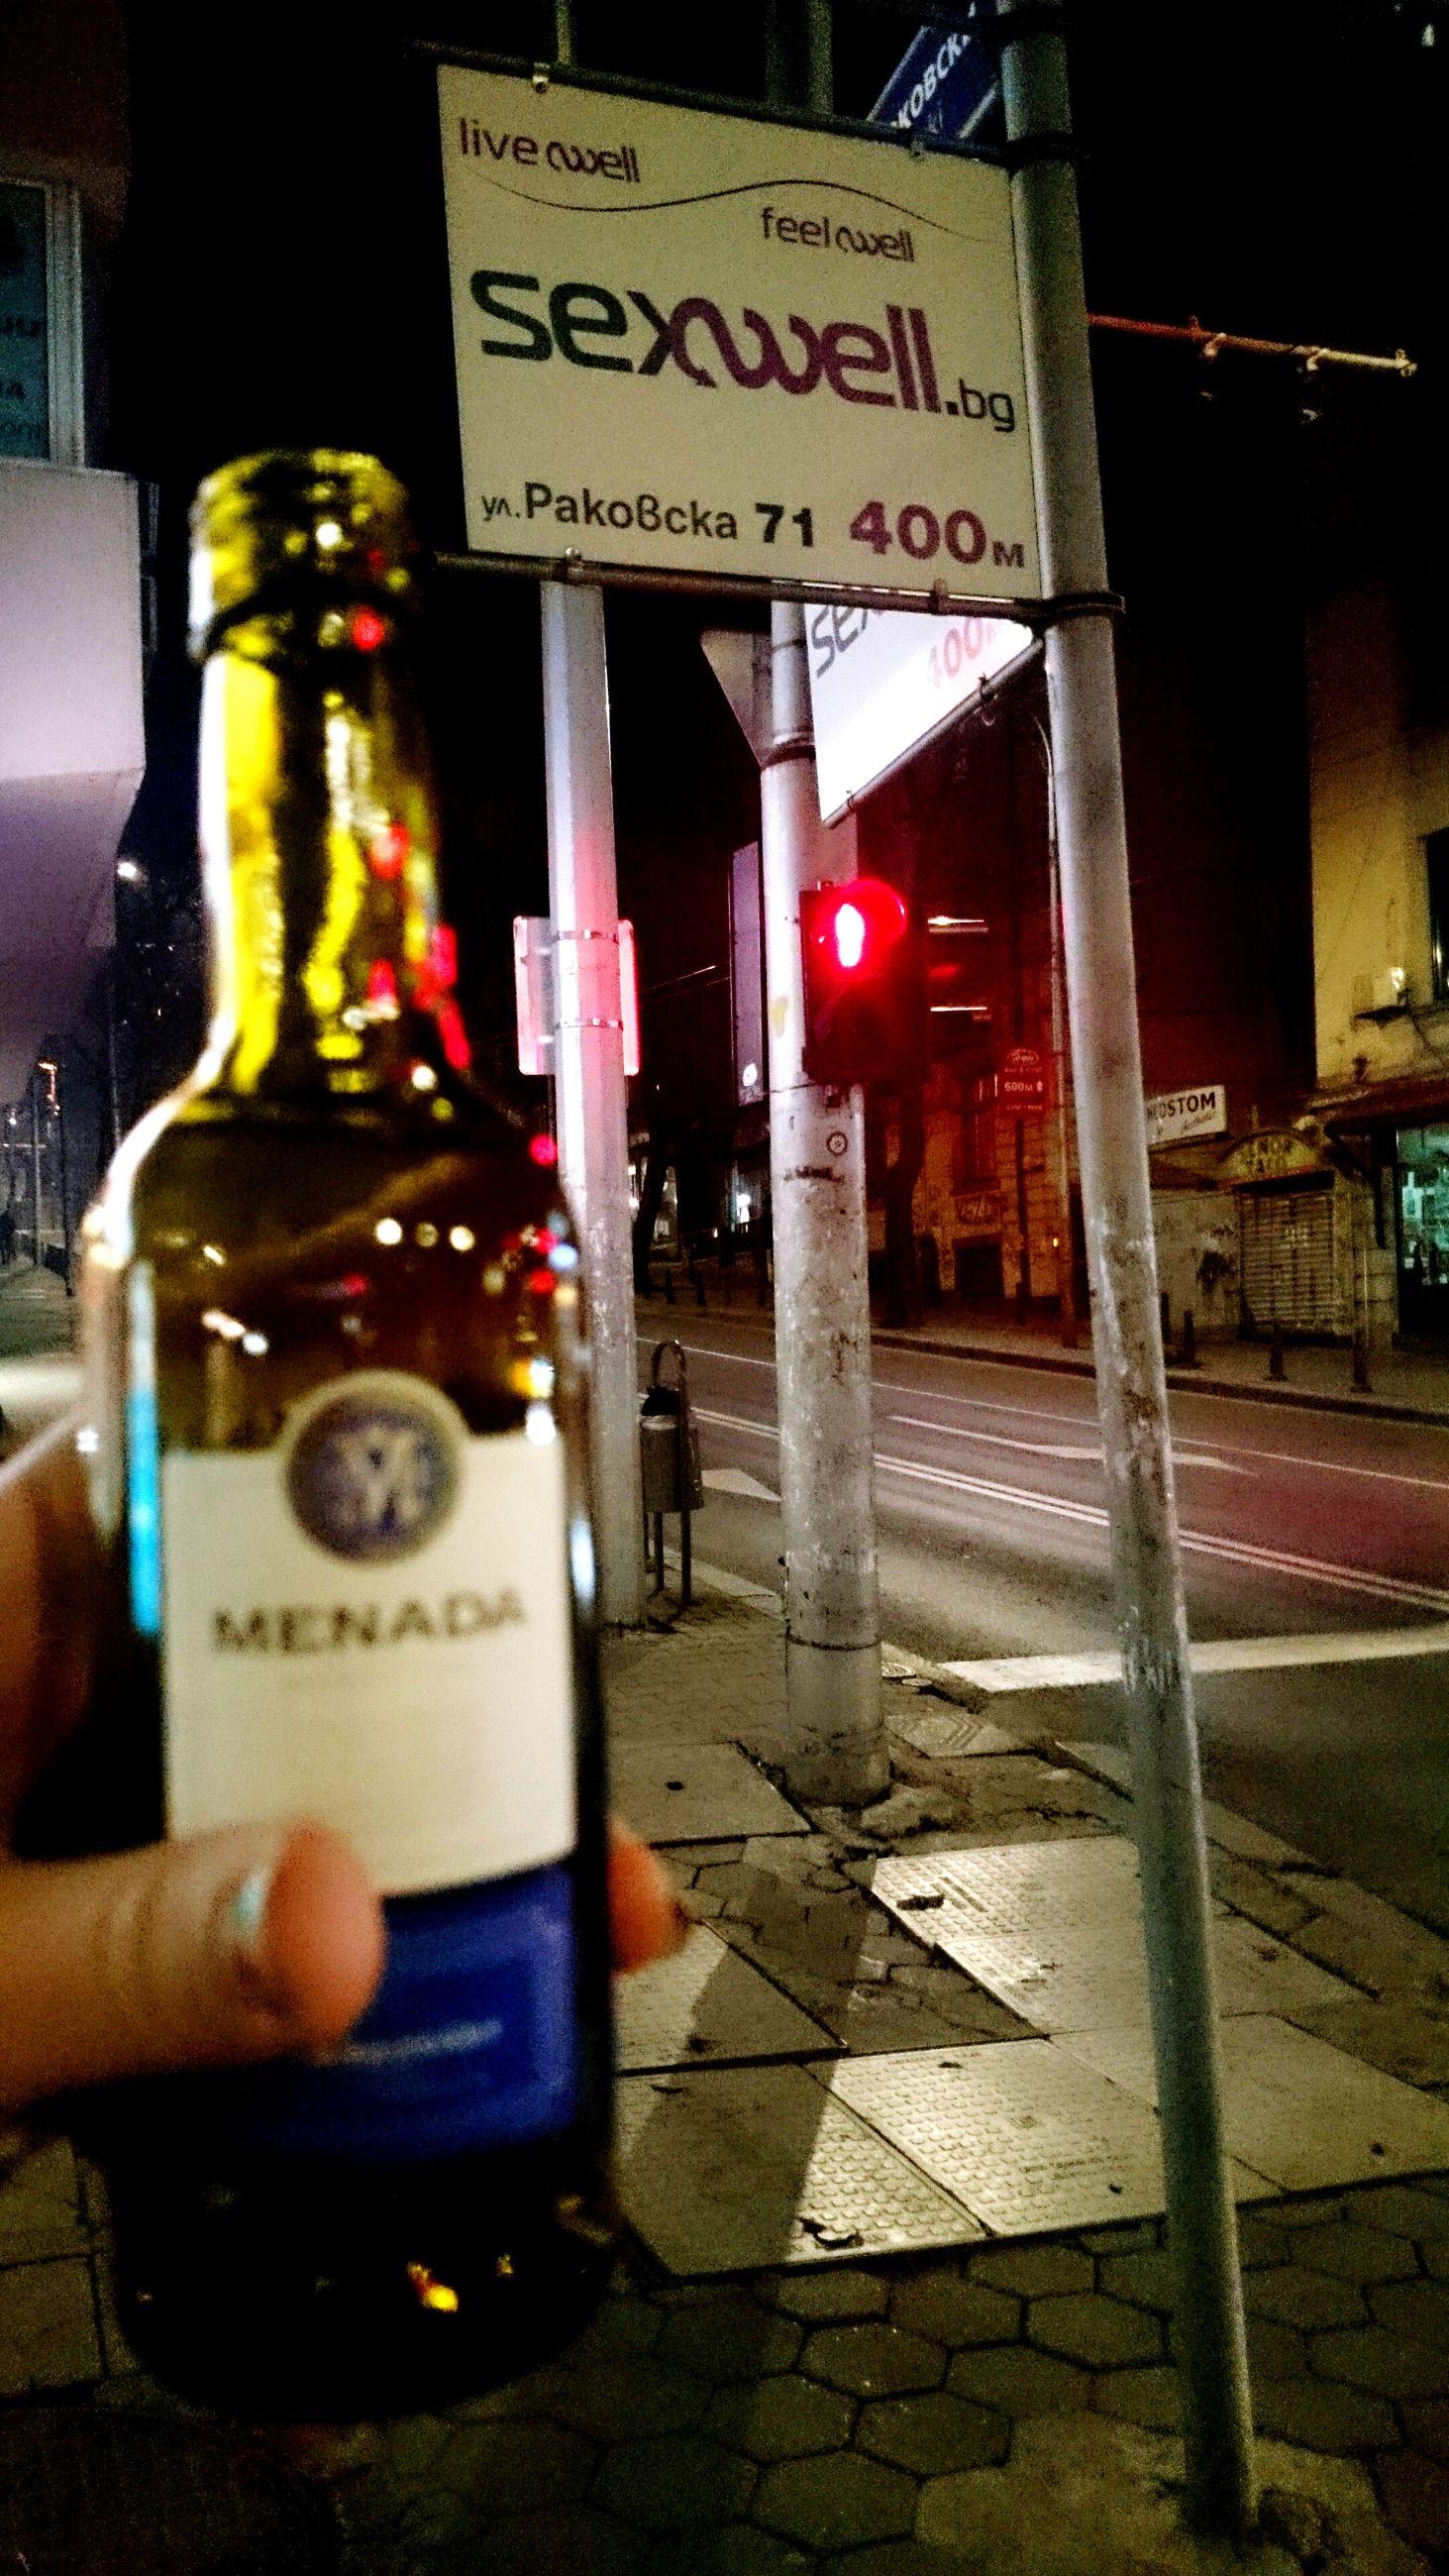 night, illuminated, text, lifestyles, communication, street, holding, men, leisure activity, human representation, western script, city, person, unrecognizable person, incidental people, non-western script, city life